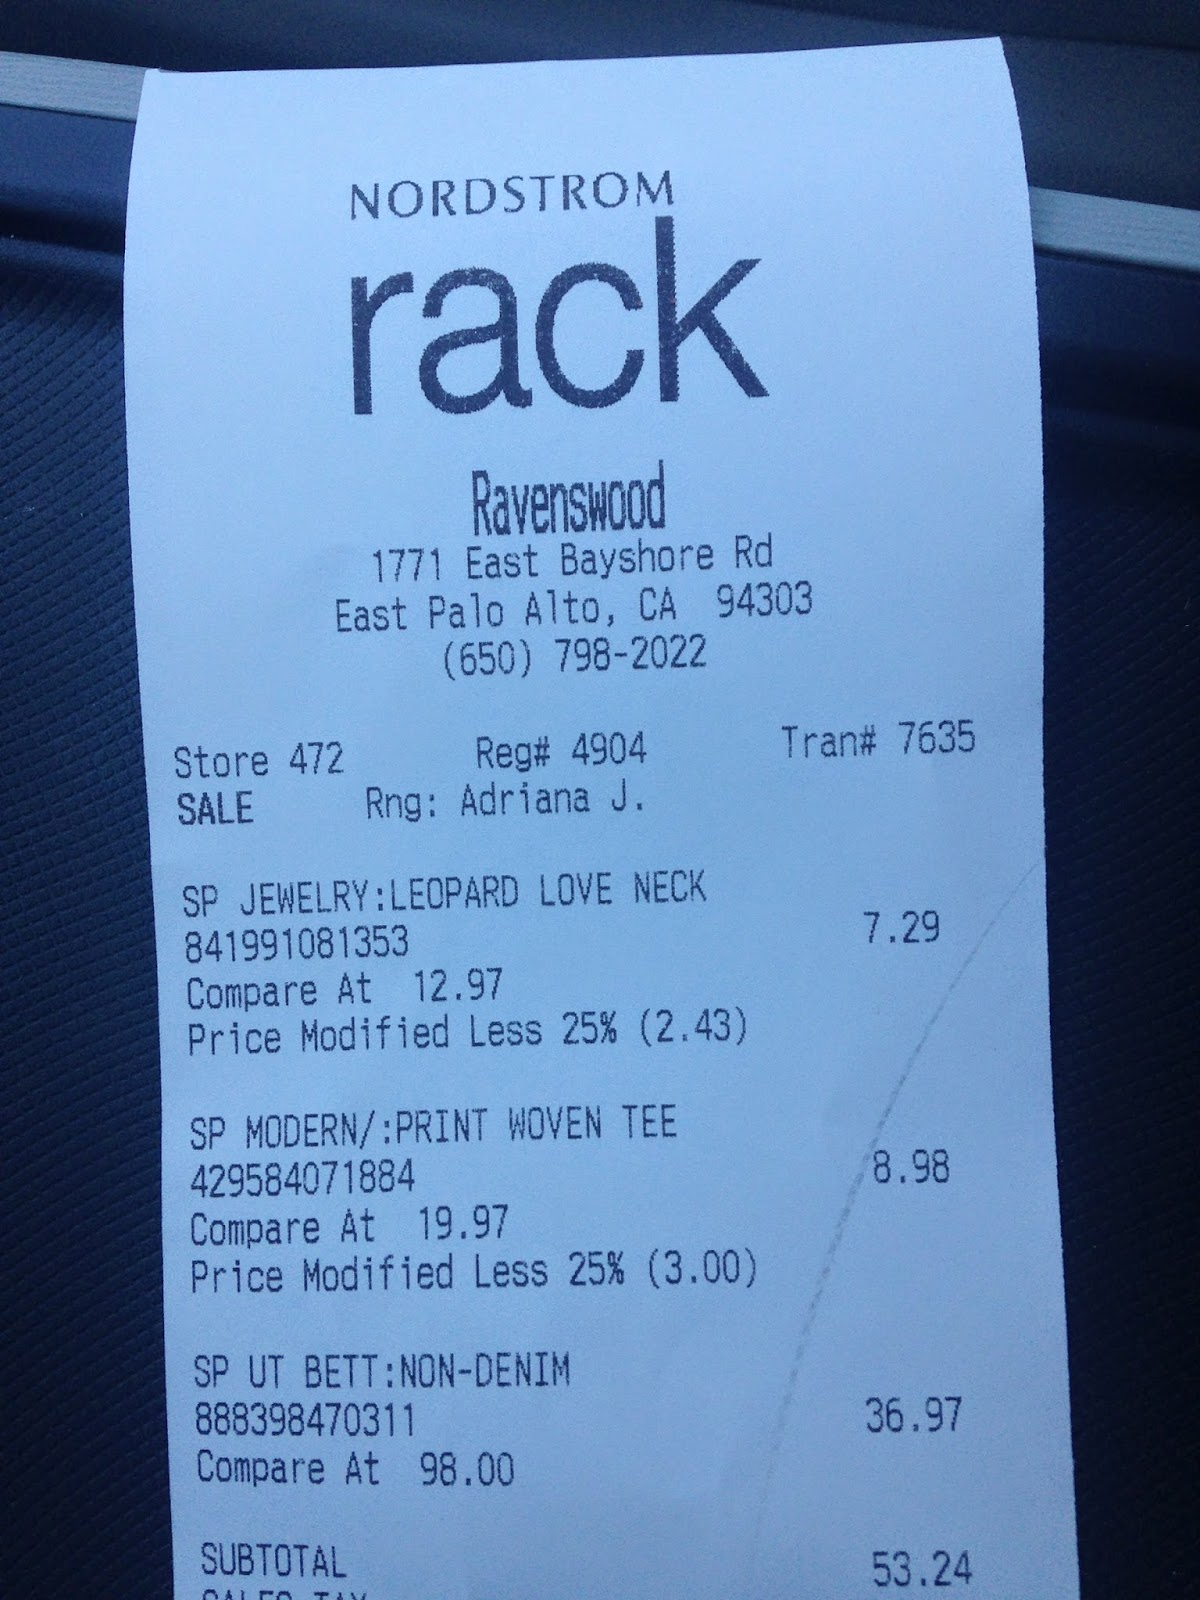 615fcce80fb nordstrom rack email receipt - Racks Blog Ideas